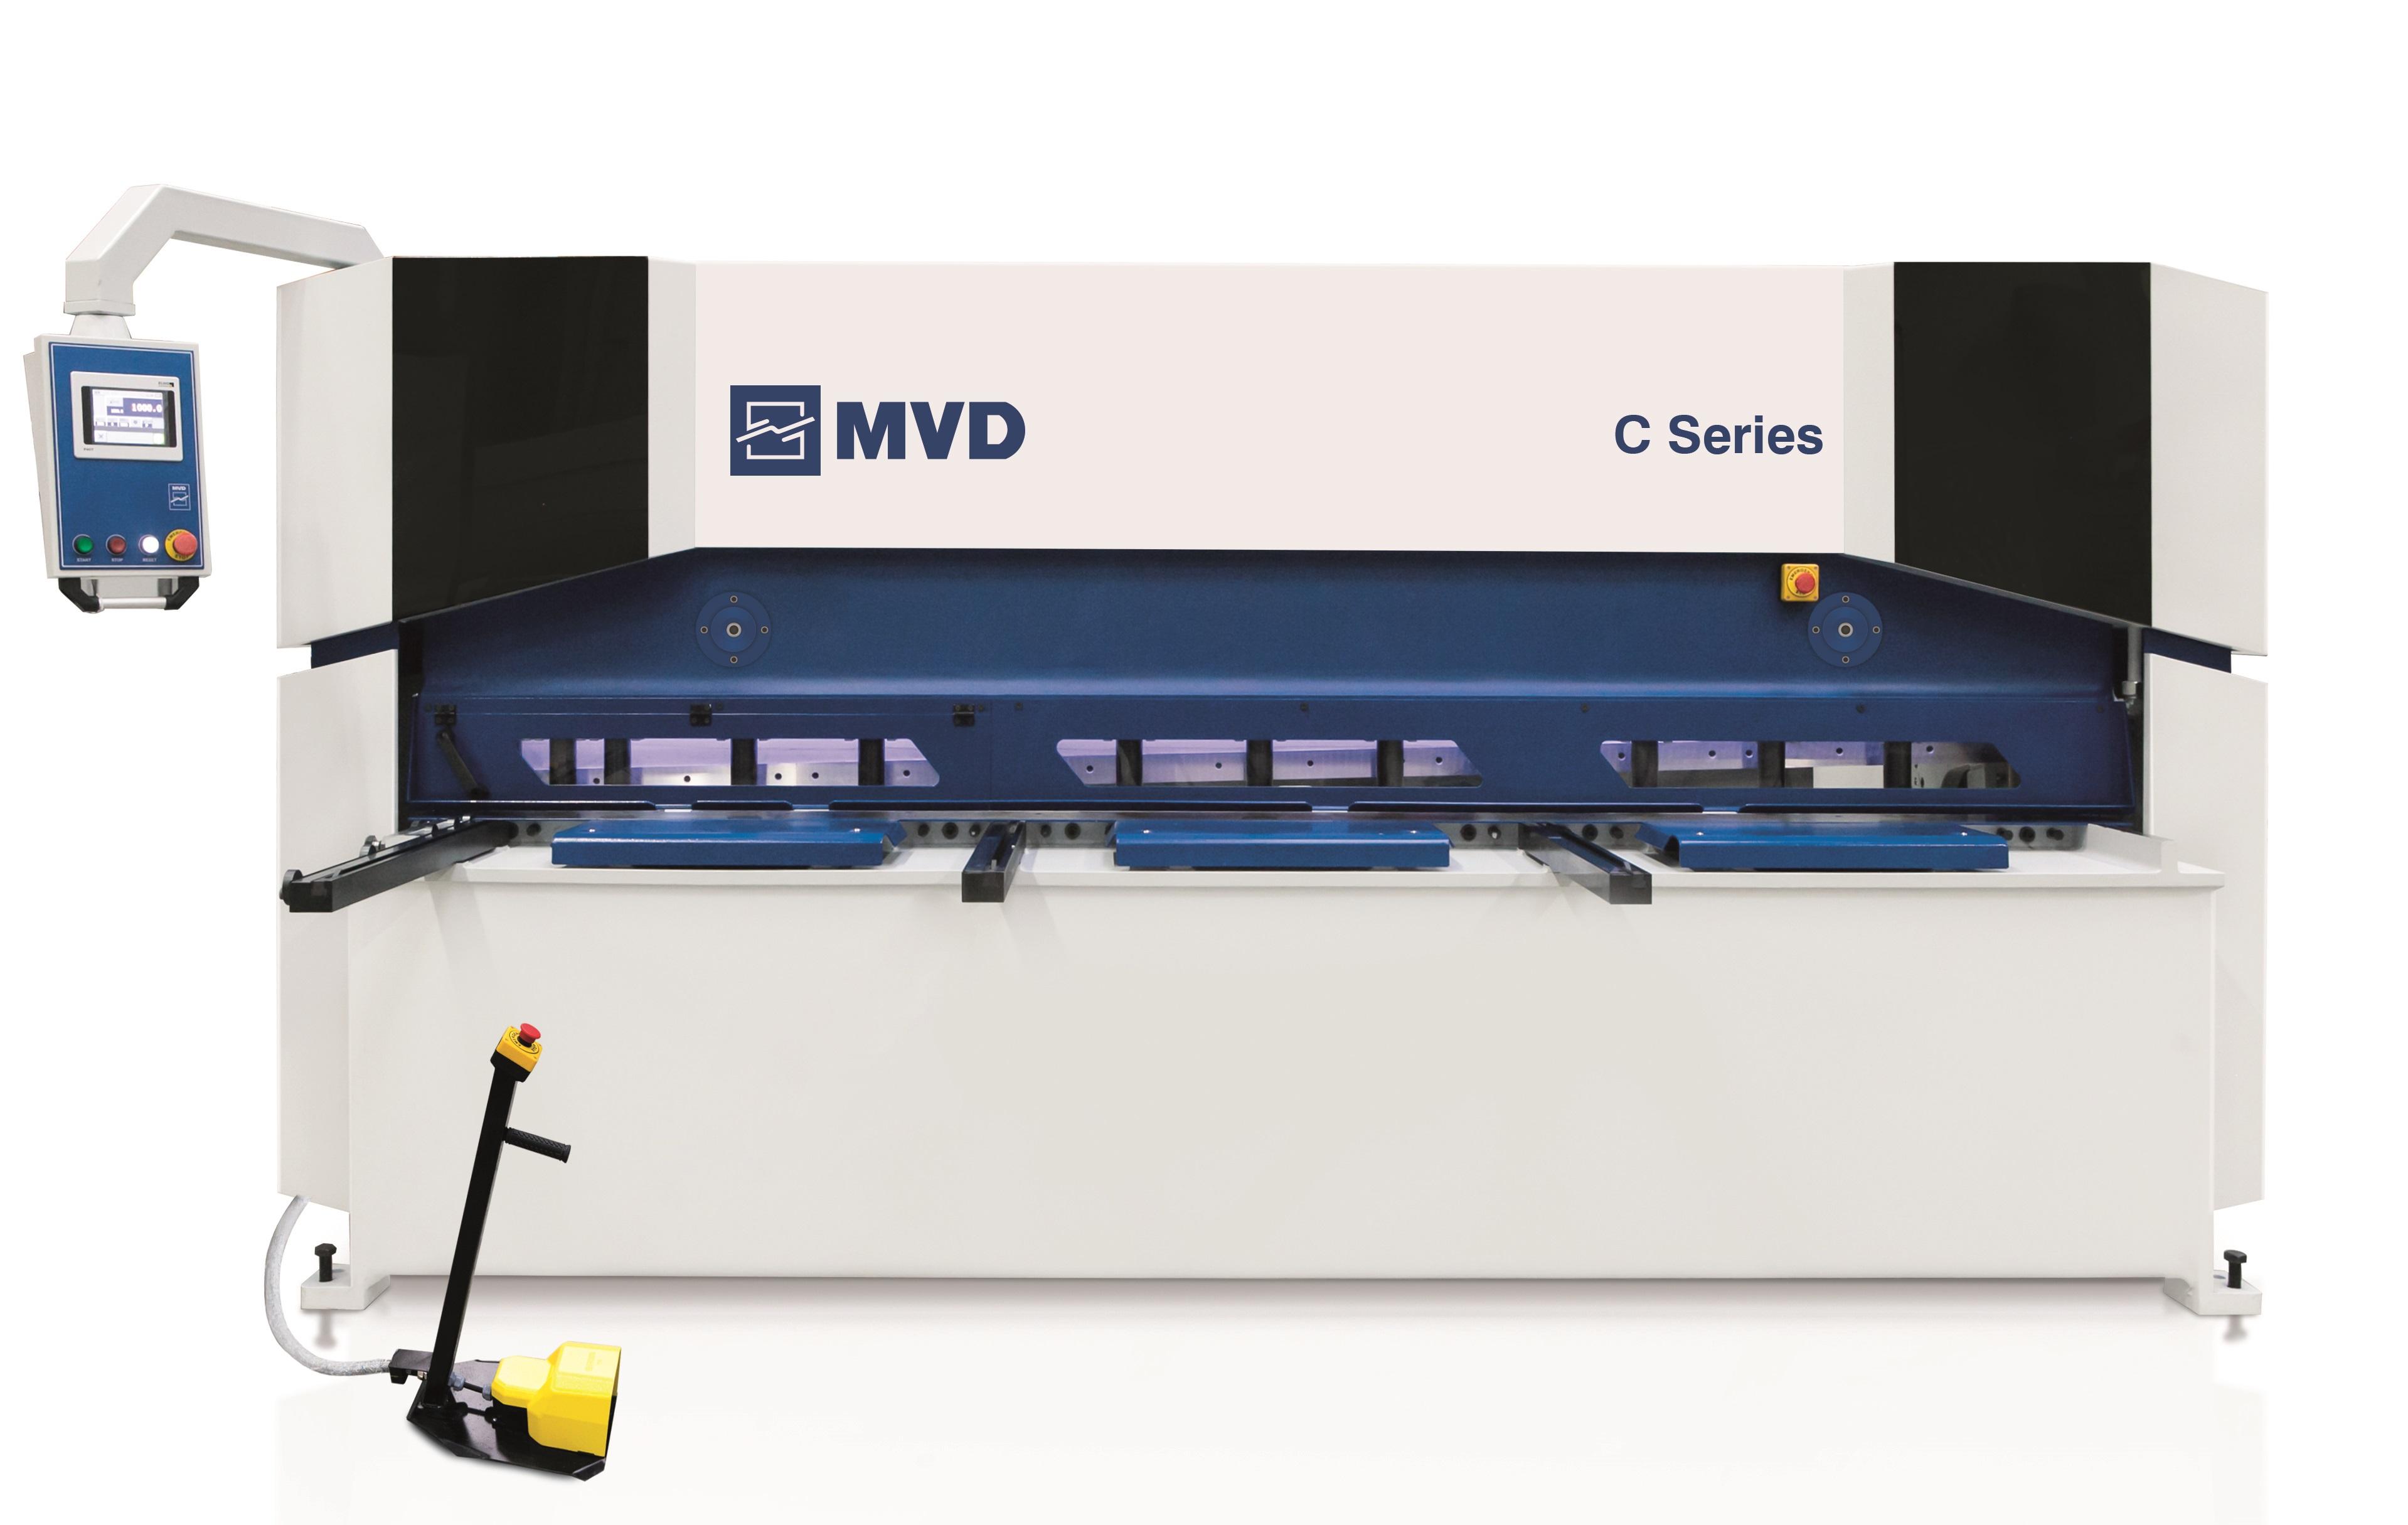 MVD cnc-ohjattu levyleikkuri.